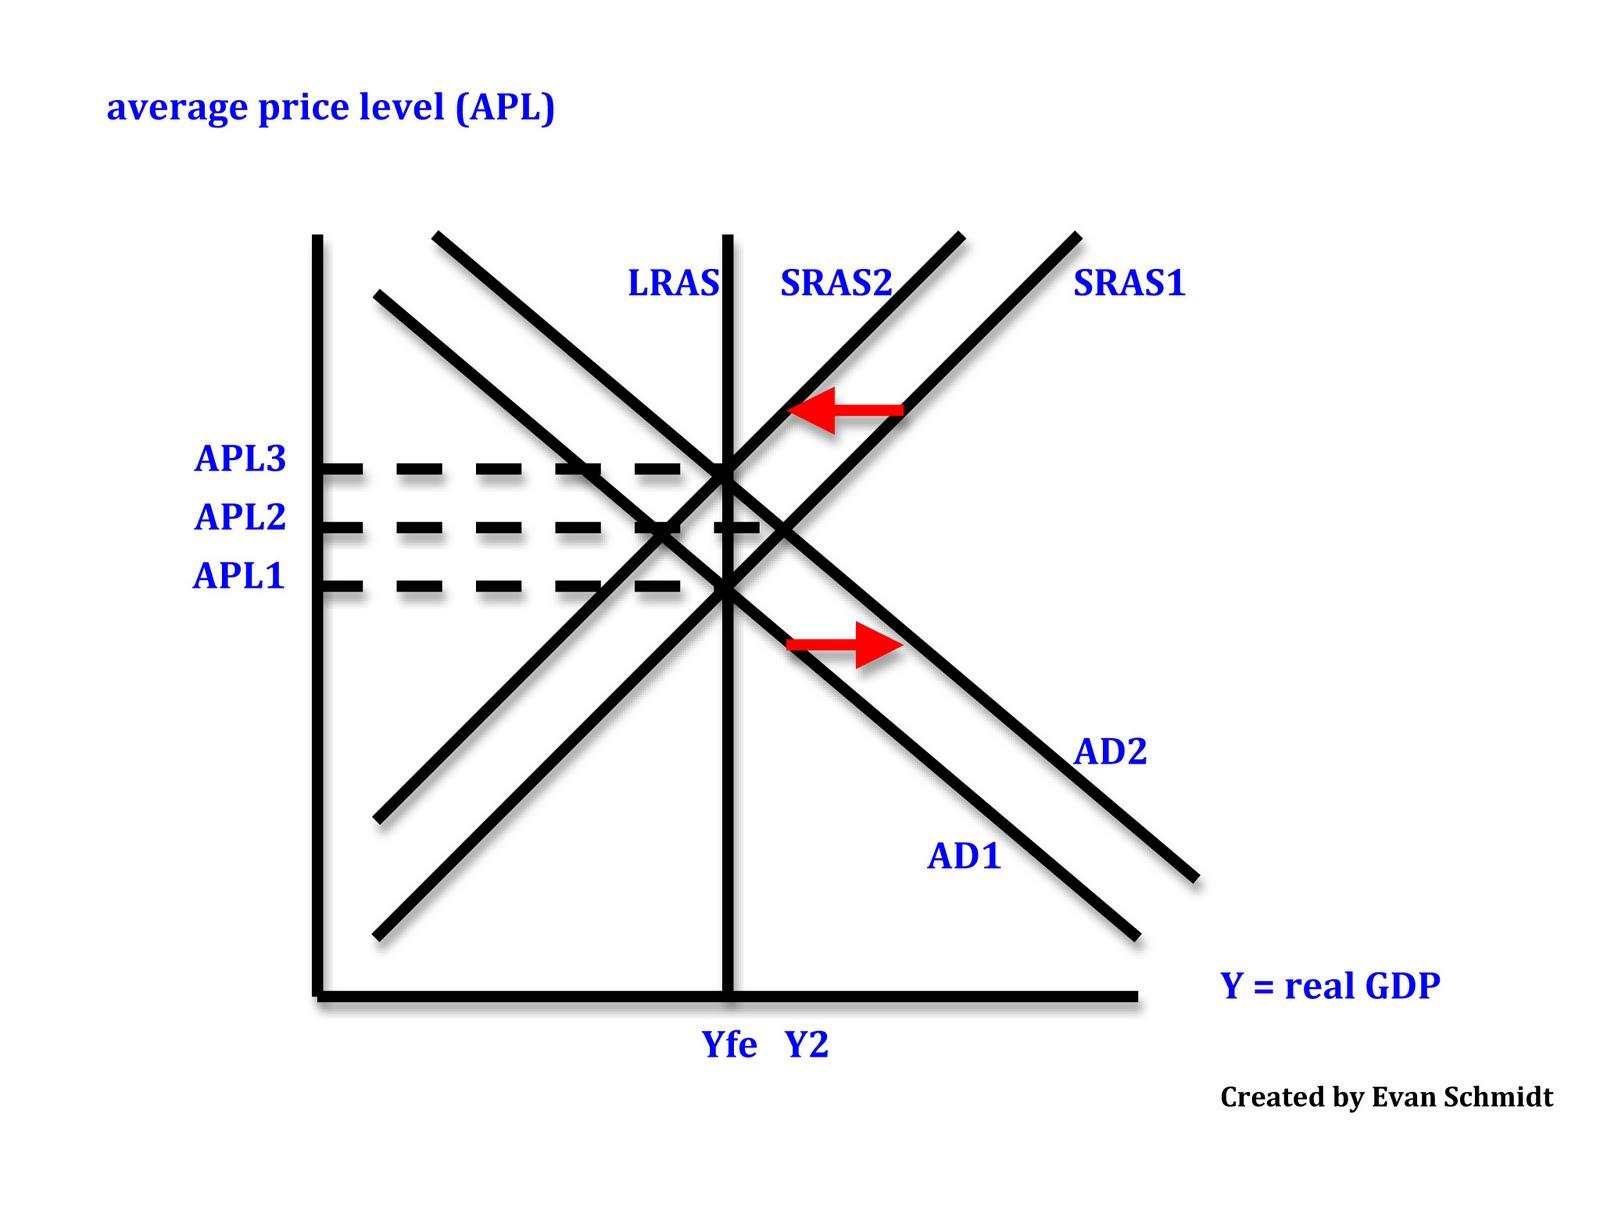 Macro Economic Diagrams